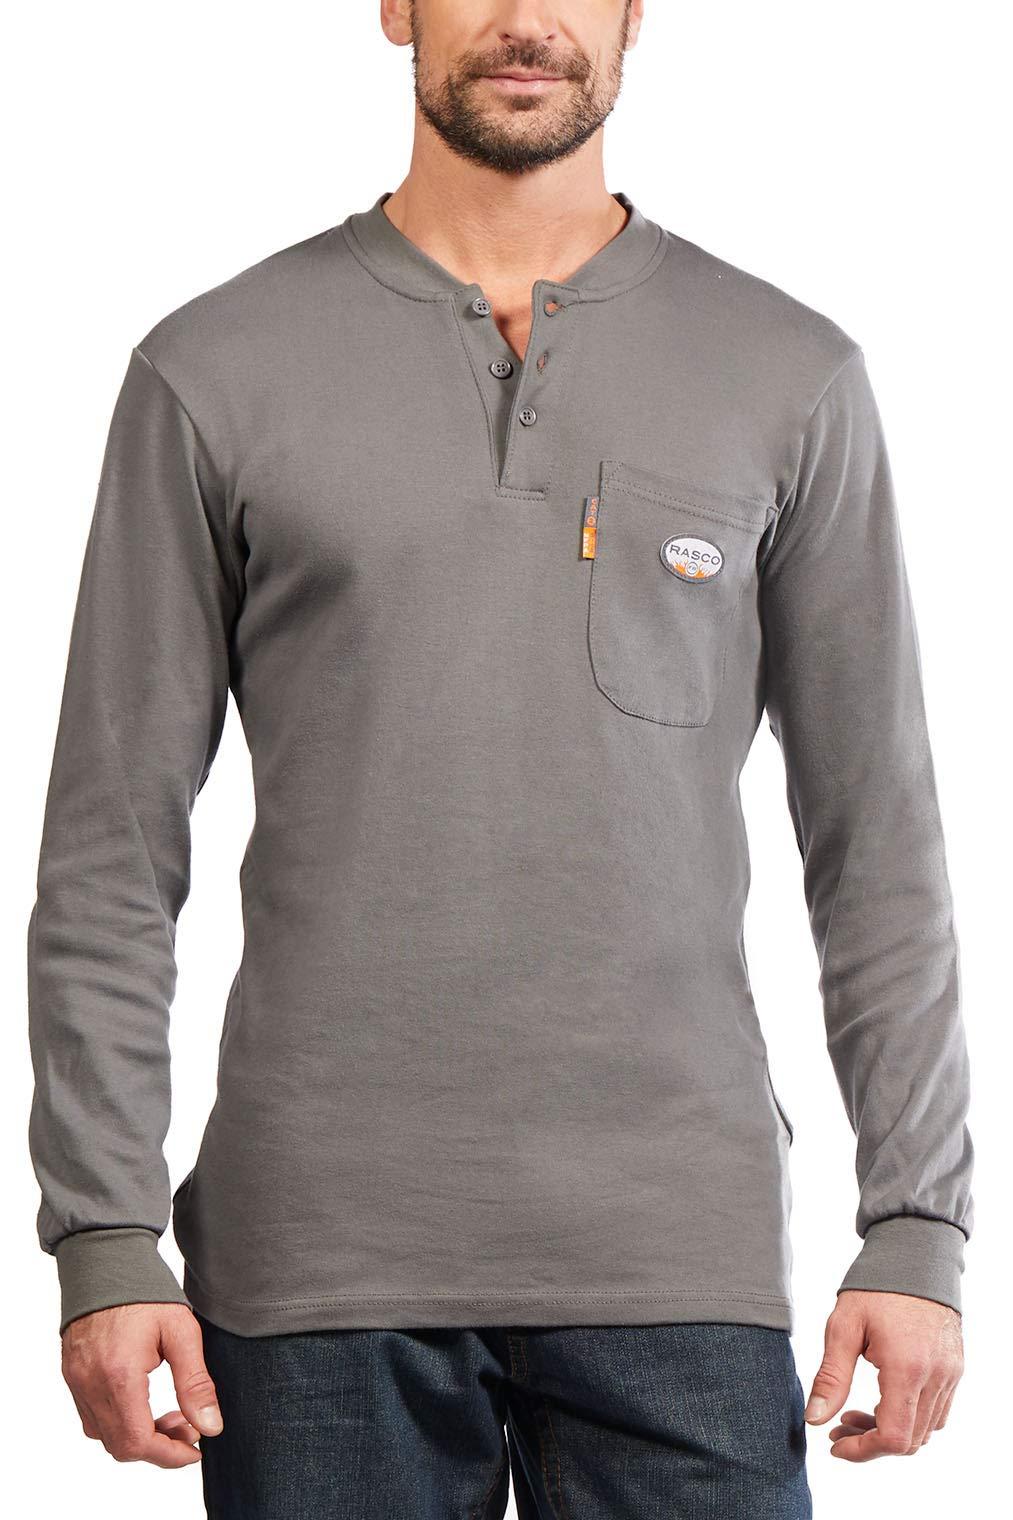 Rasco FR Mens Two-Tone Henley T-Shirt